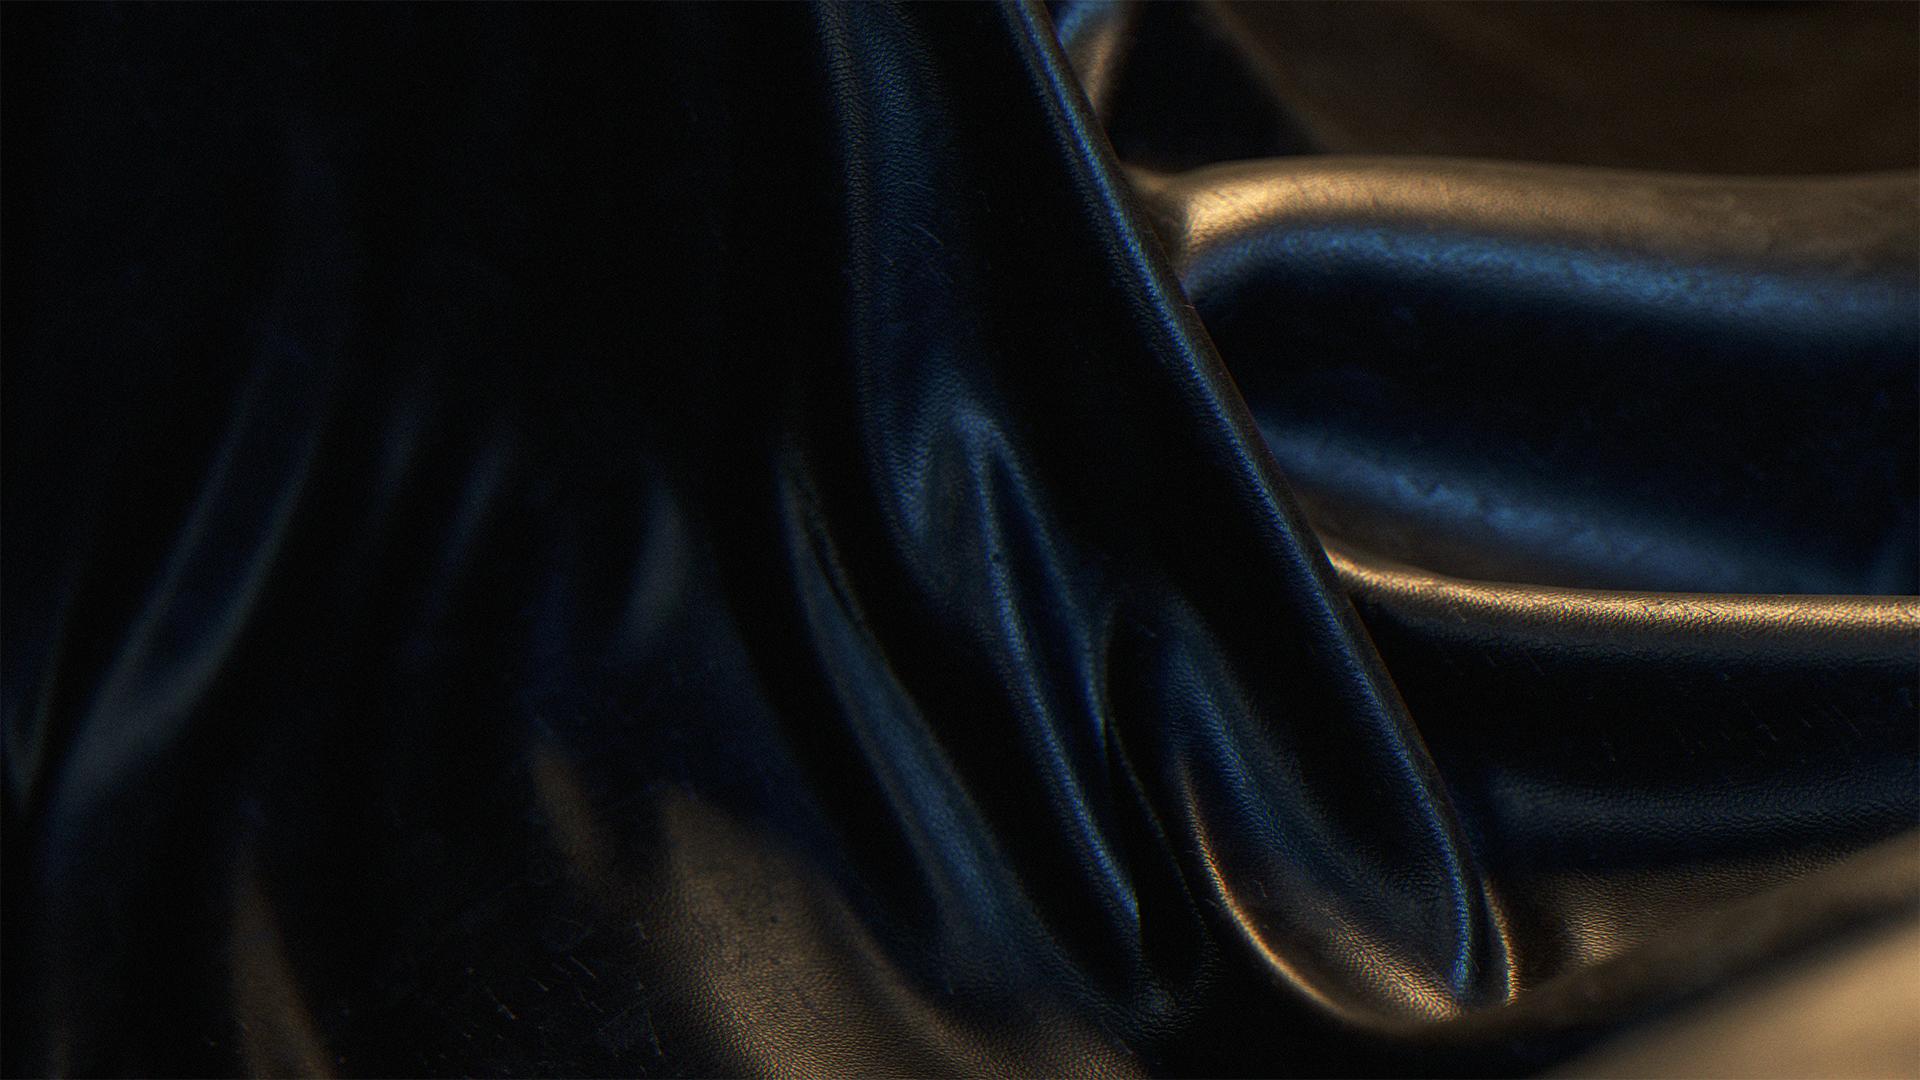 01_December_Materialthon_03_Leather_Frame.jpg